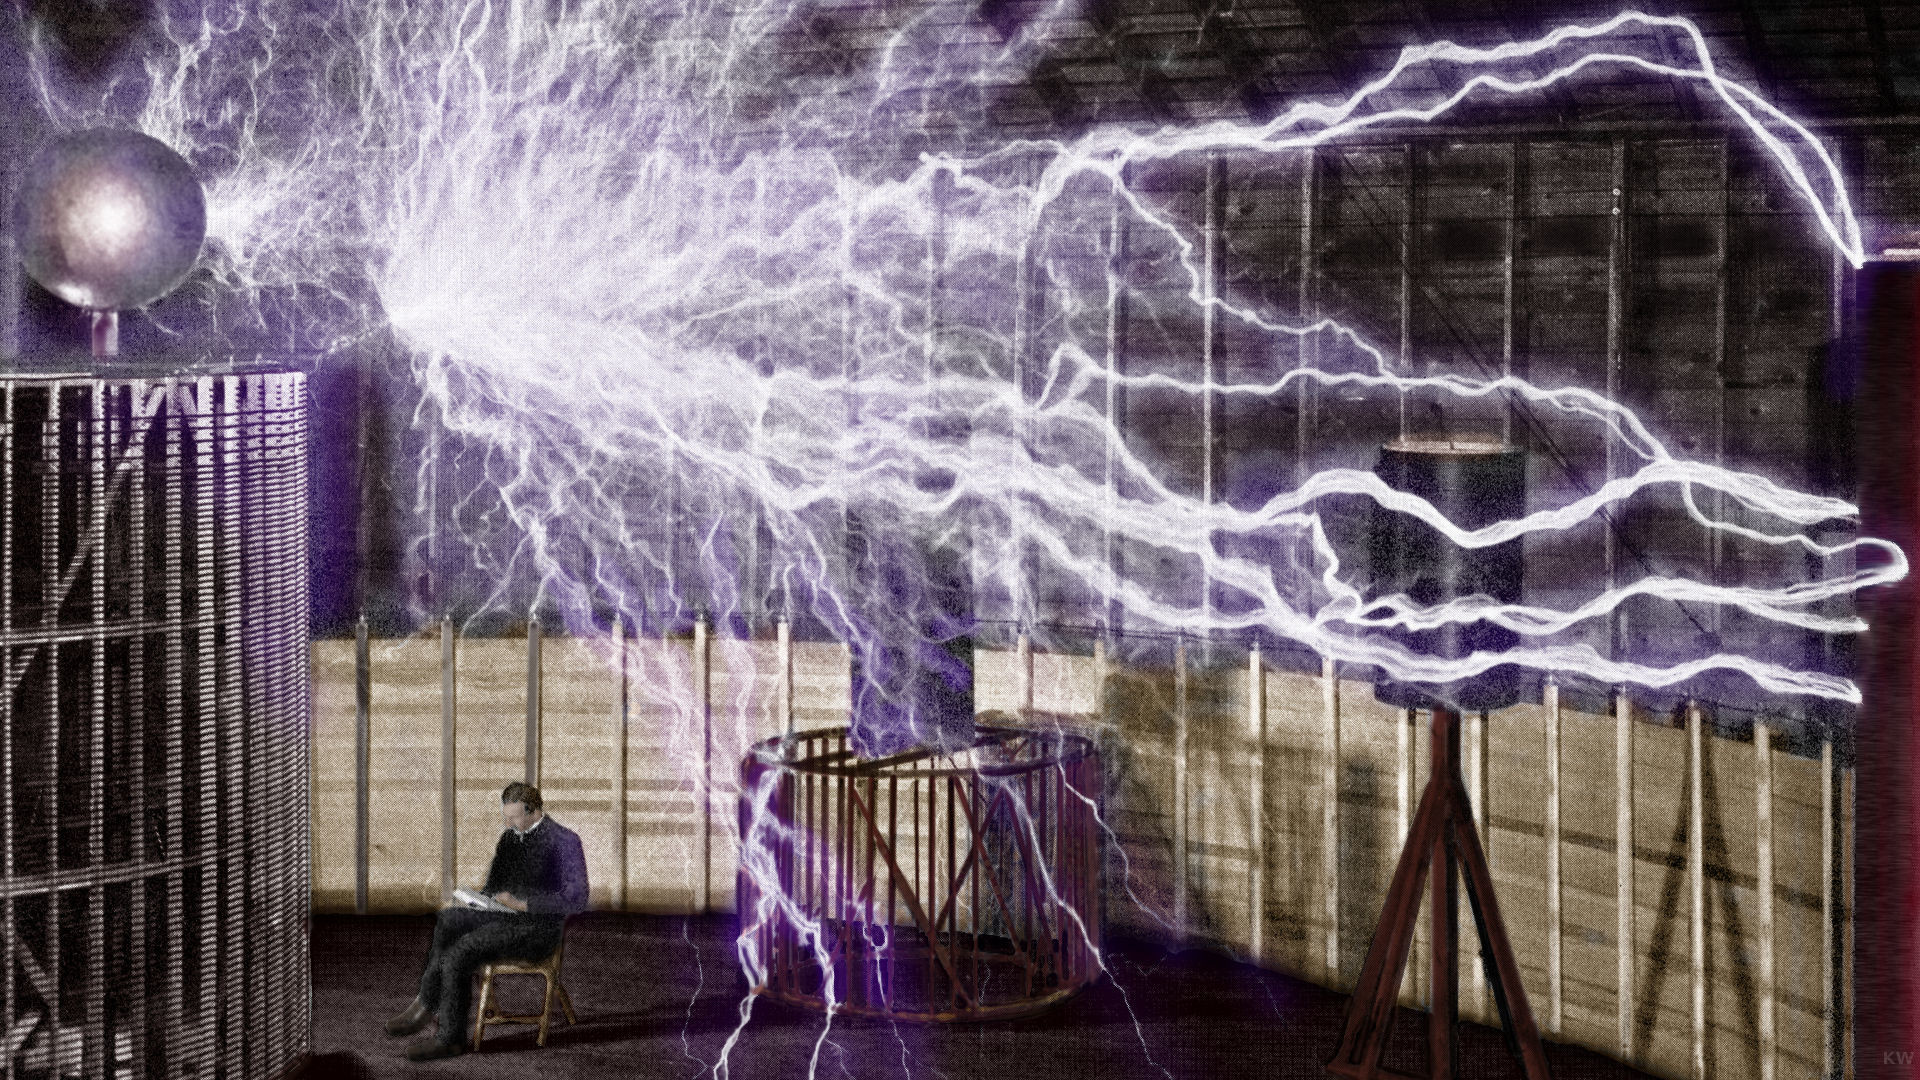 Tesla Wallpaper Iphone >> Nikola Tesla Wallpaper HD (67+ images)